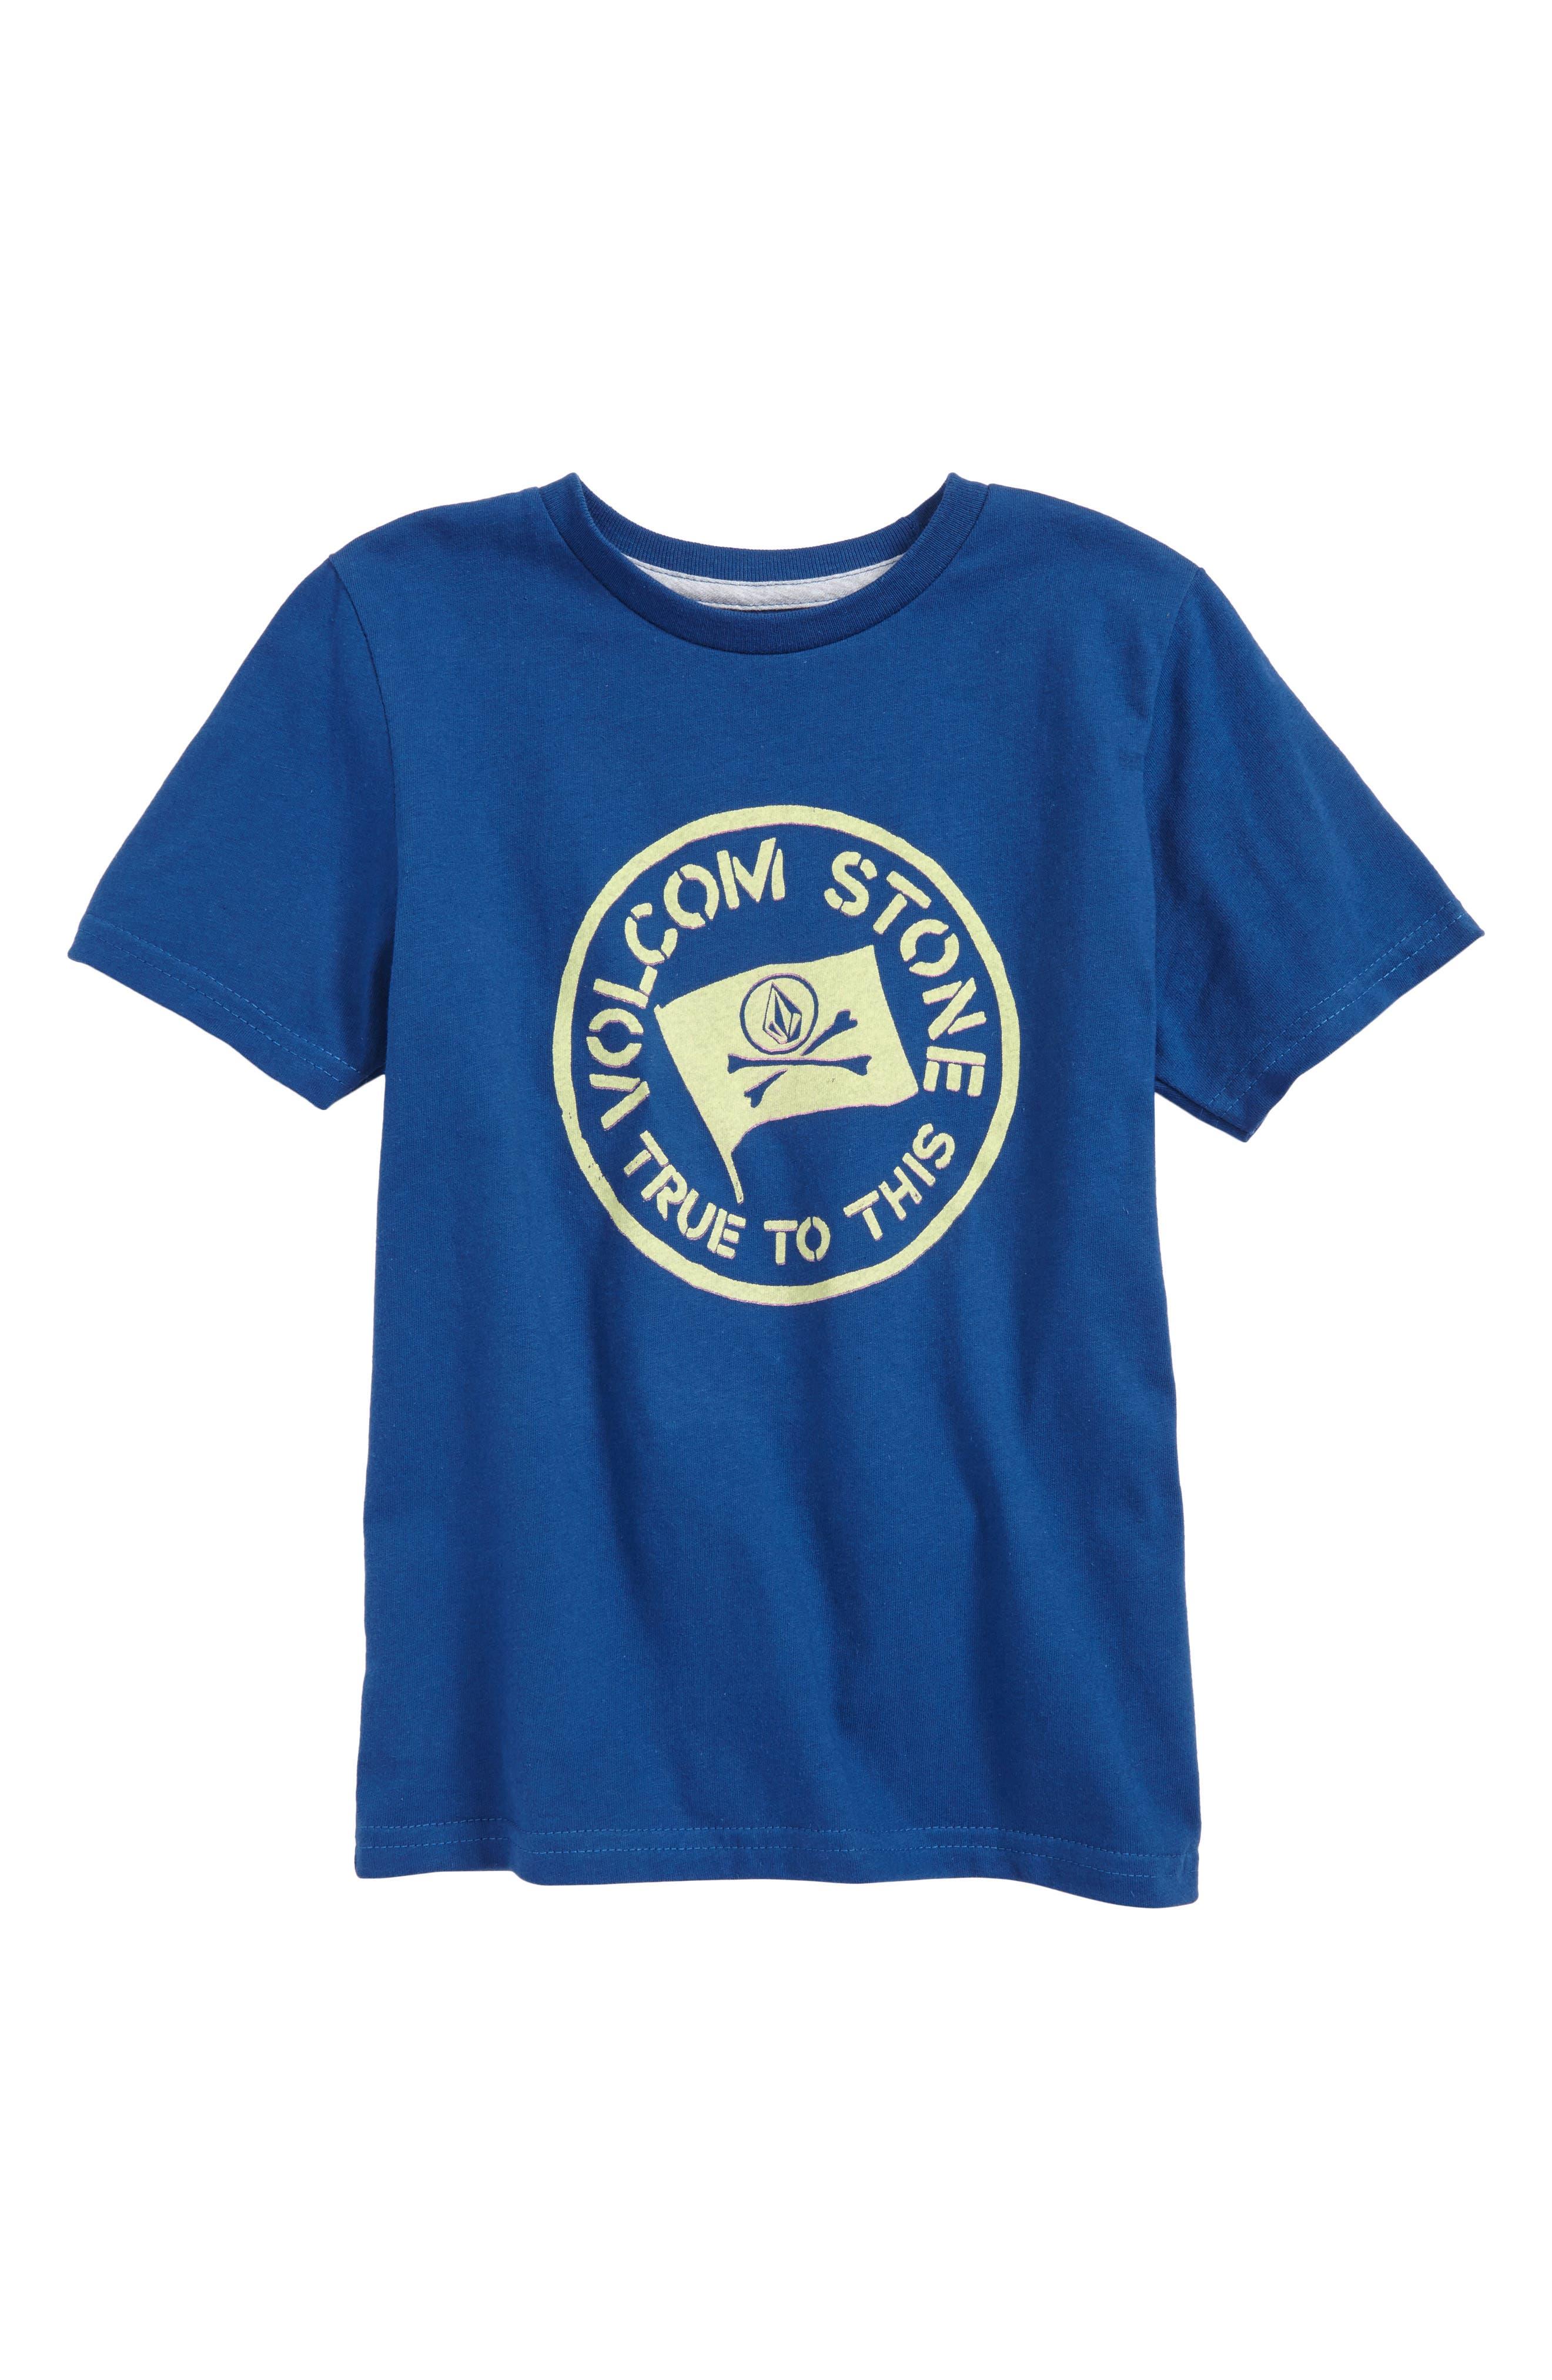 Jolly Rebel T-Shirt,                             Main thumbnail 1, color,                             Camper Blue